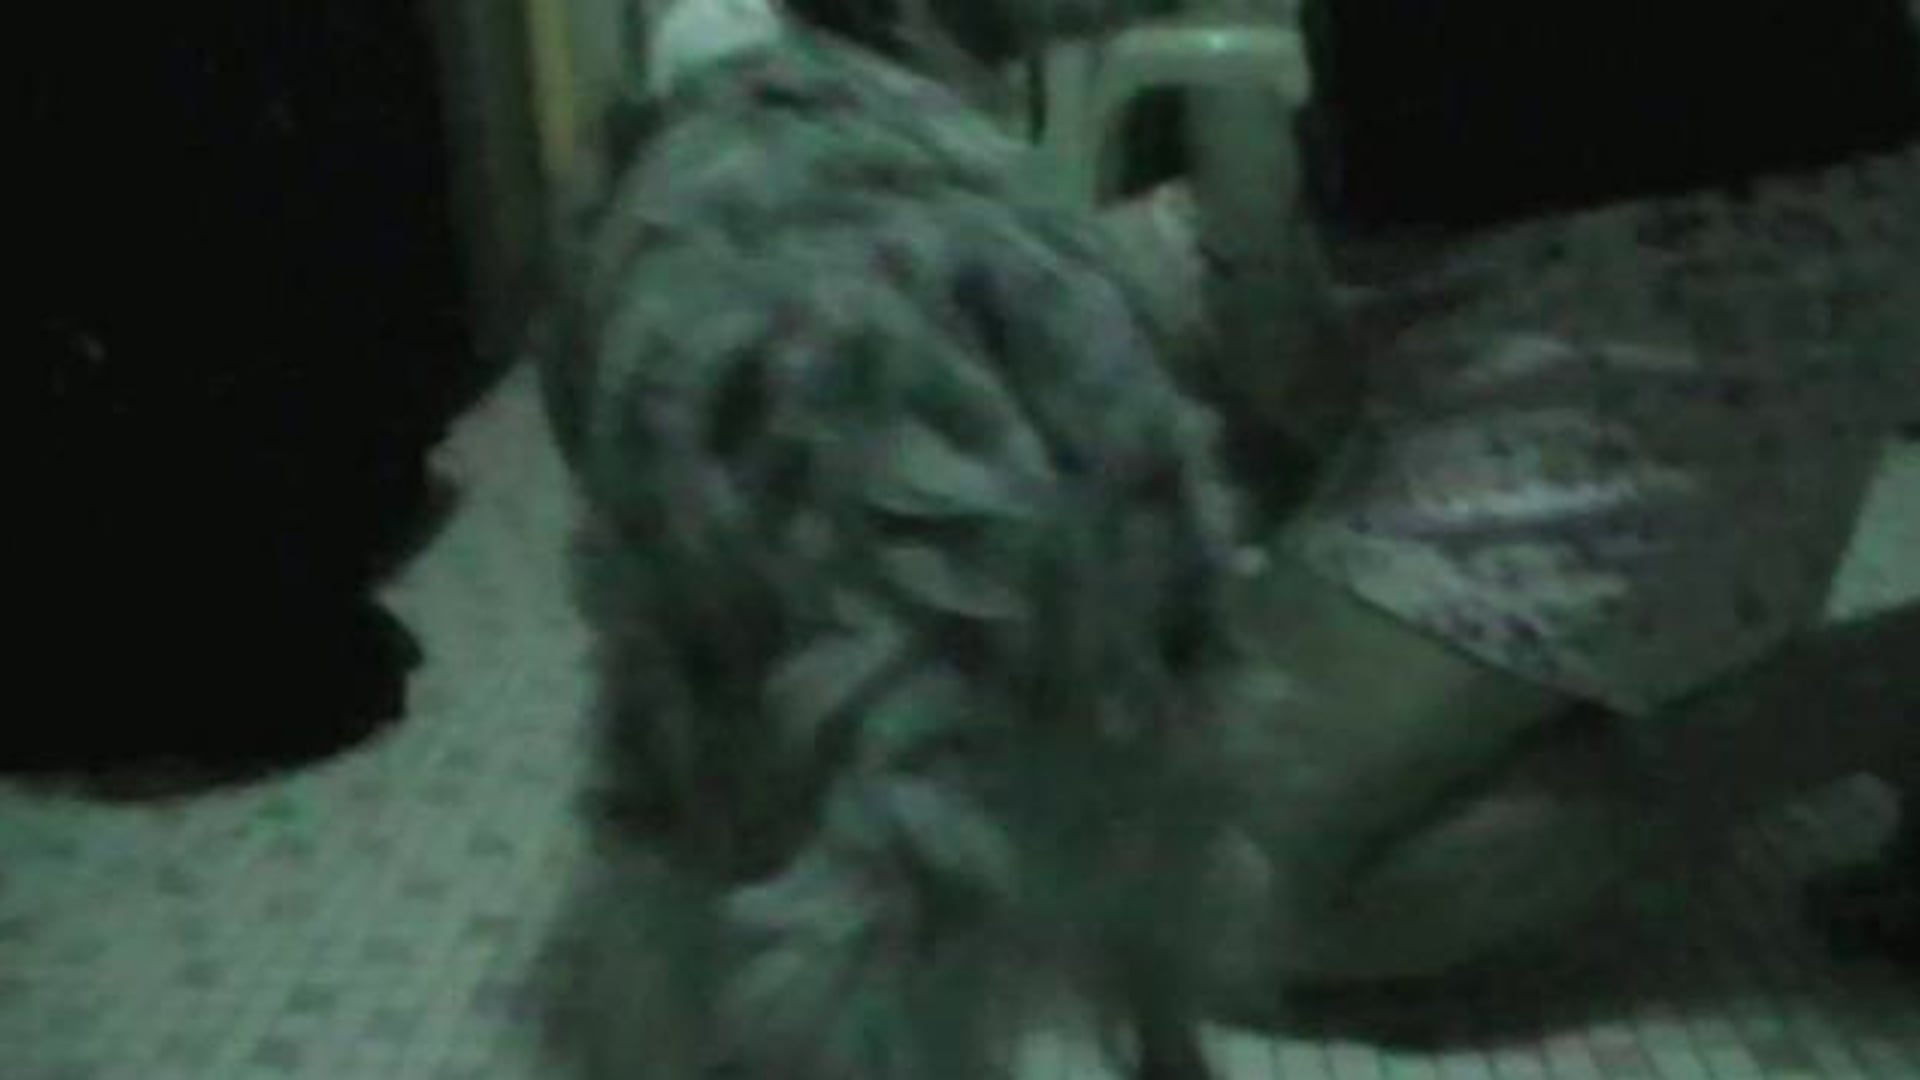 Hershey learning to pee like a boy trick!